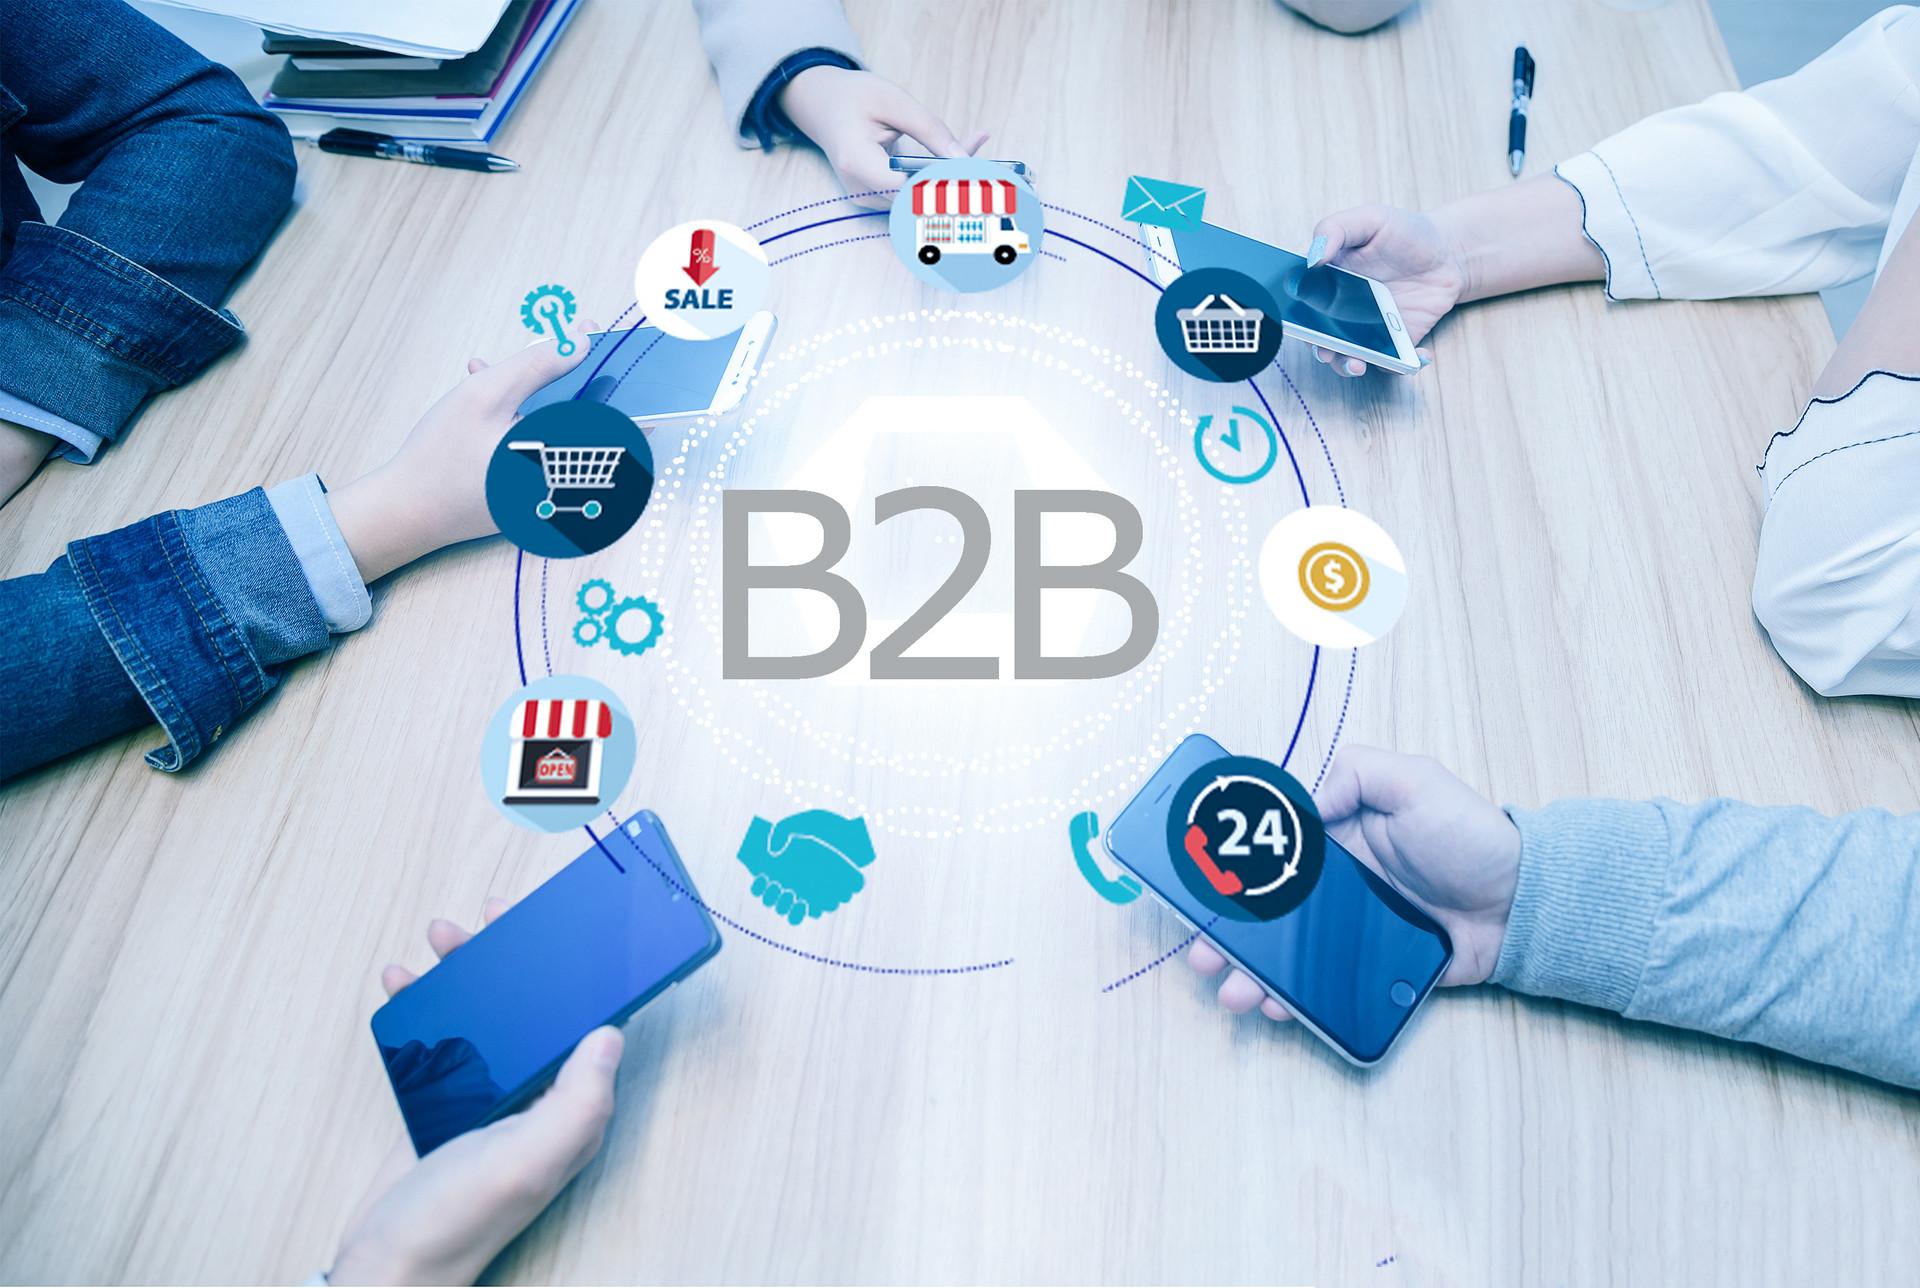 B2B供应链企业会是下一个BAT吗?